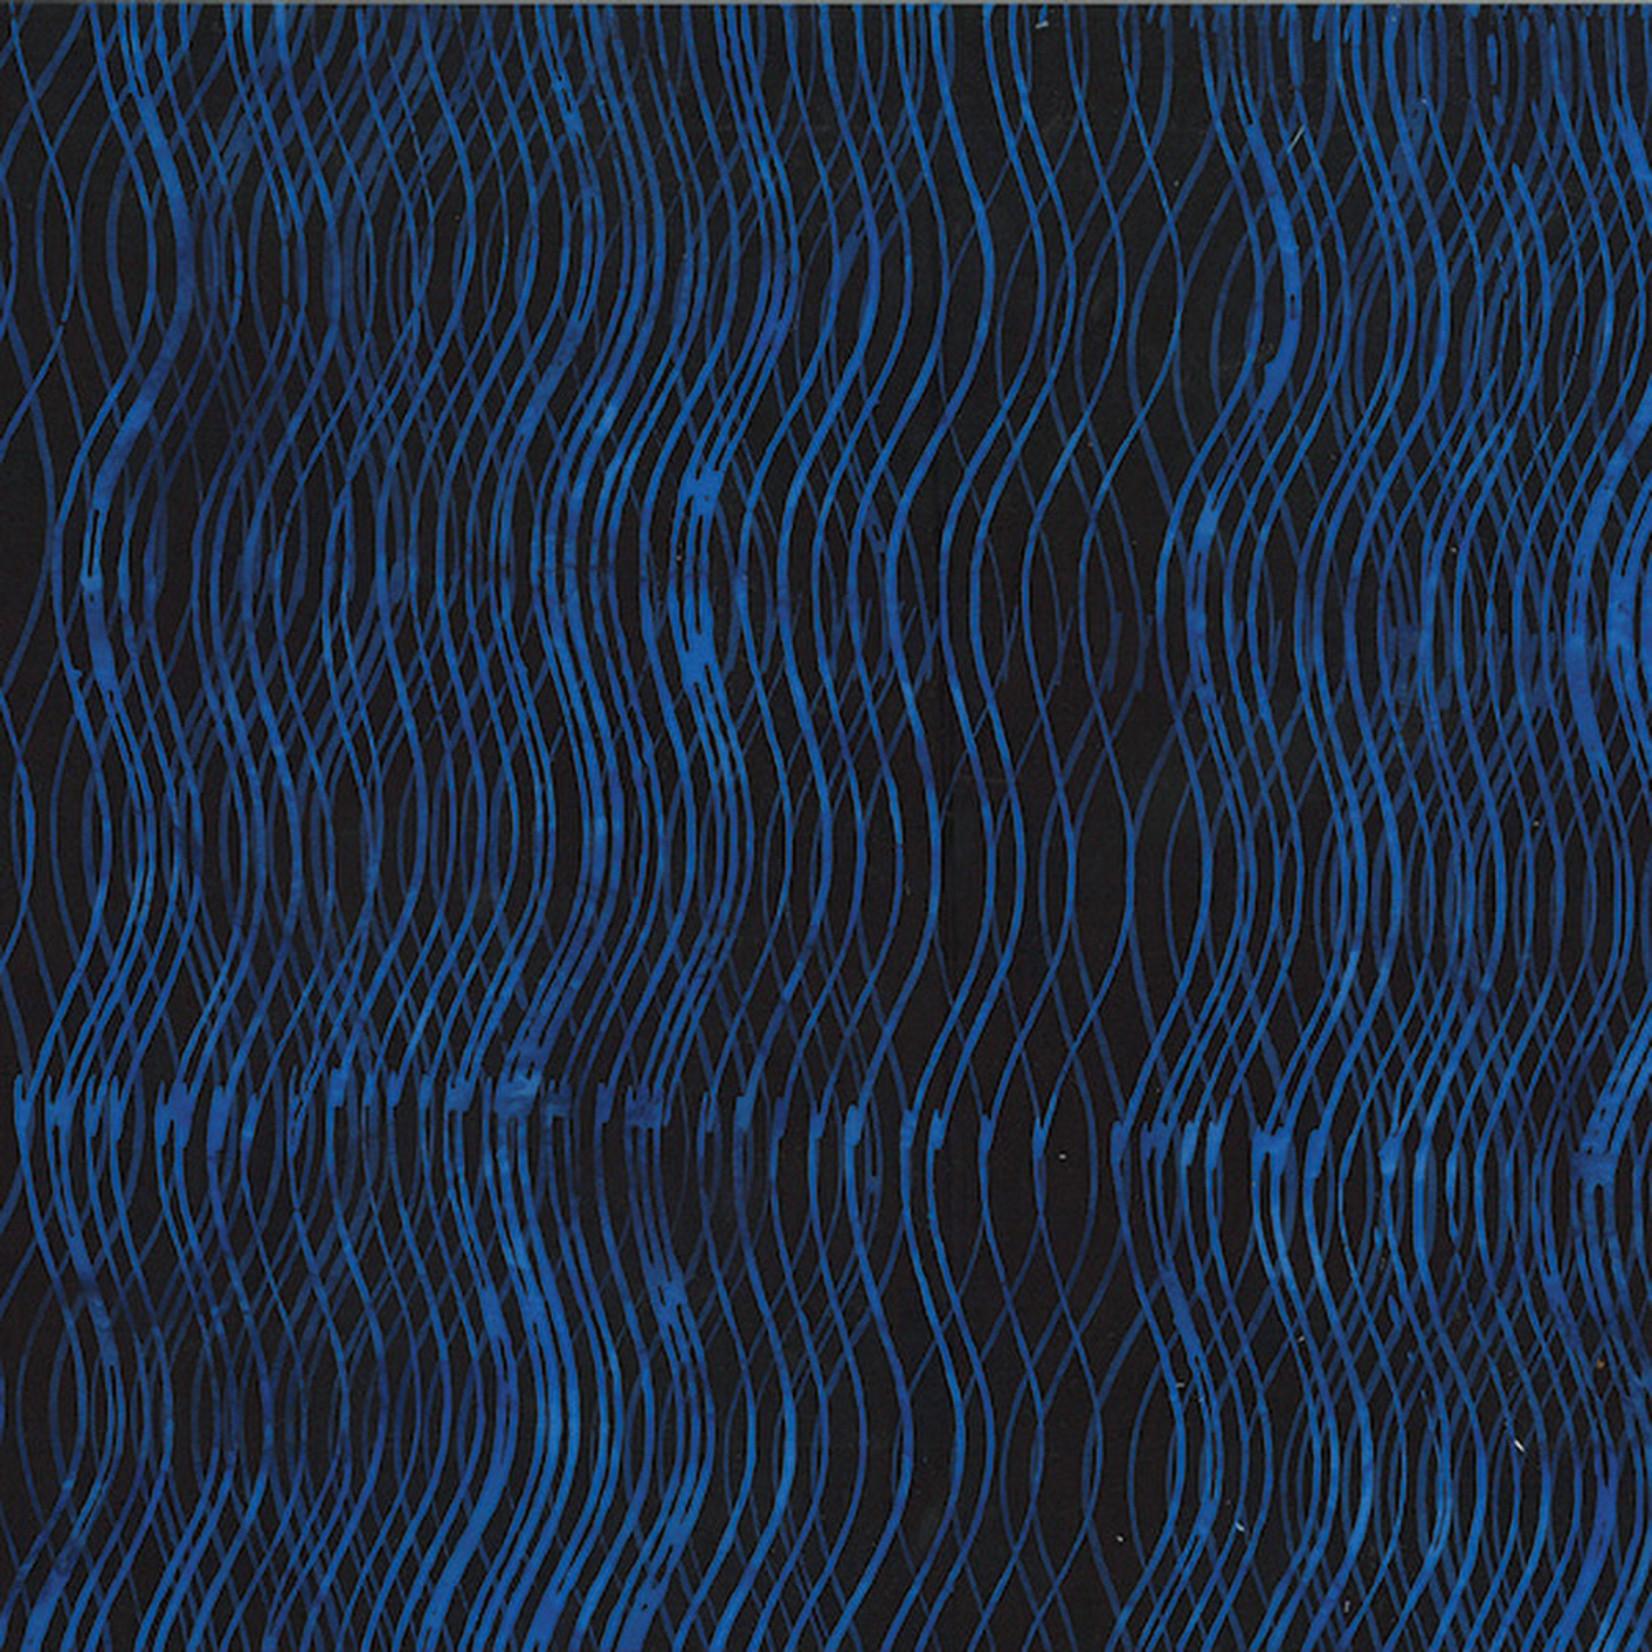 Hoffman Fabrics Bali Batik Wave - Midnight